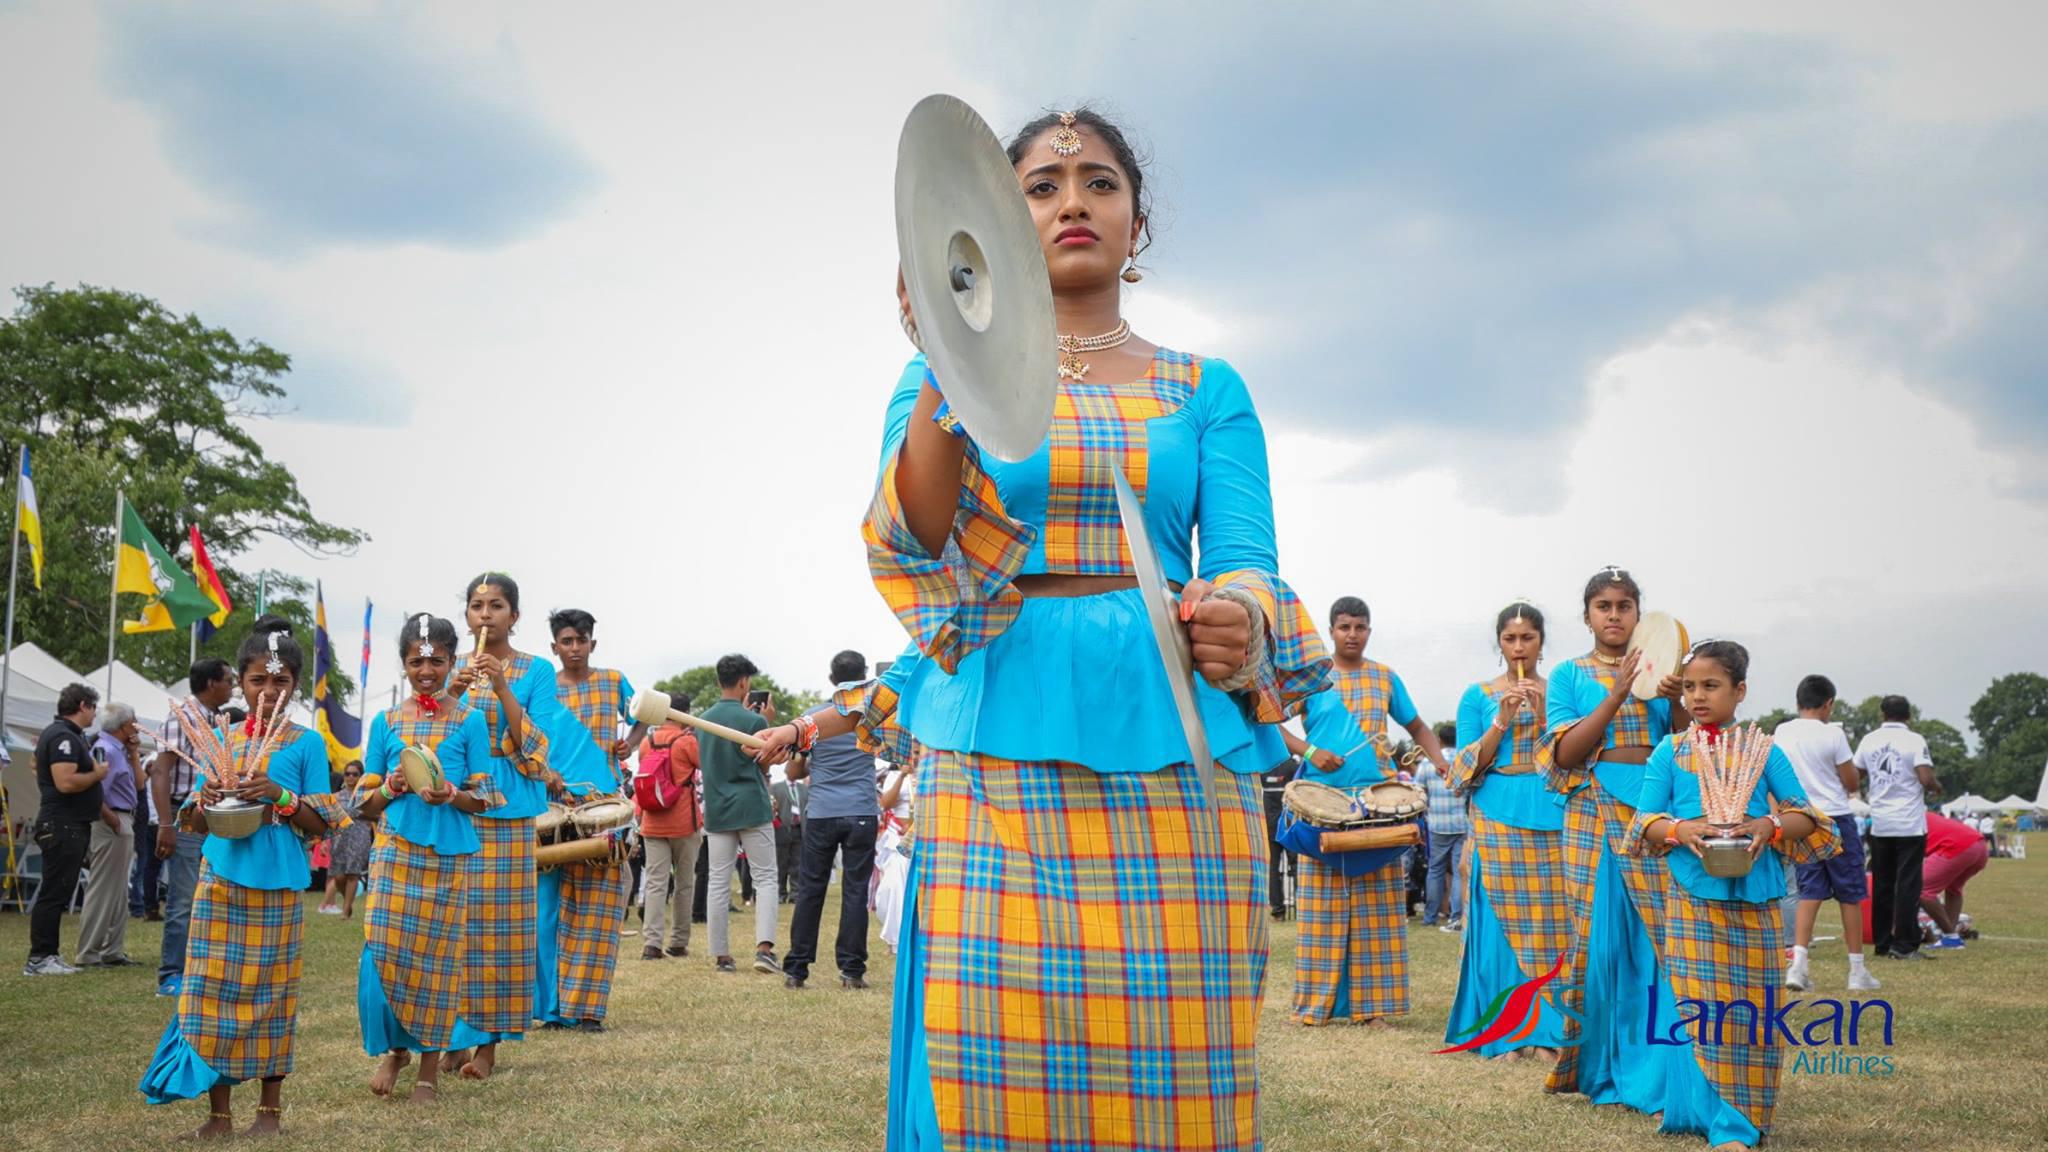 Sri-Lankan-airlines-cricket-festival-london-2017-natalia-smith--photography-Kandyan-dance-1.jpg